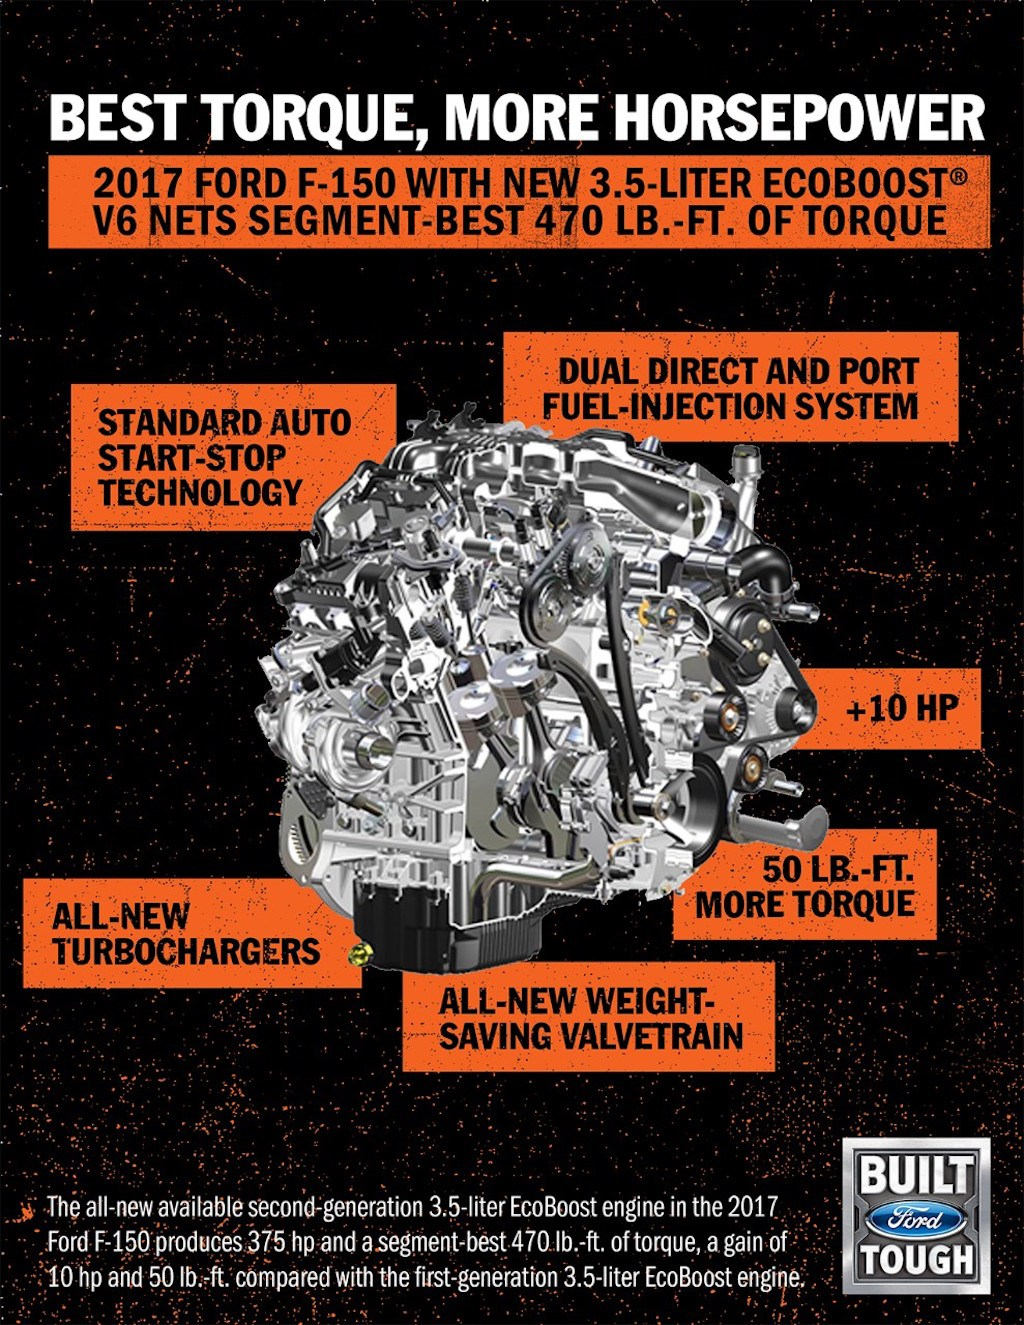 Ford F-150 with 3.5-liter EcoBoost V6